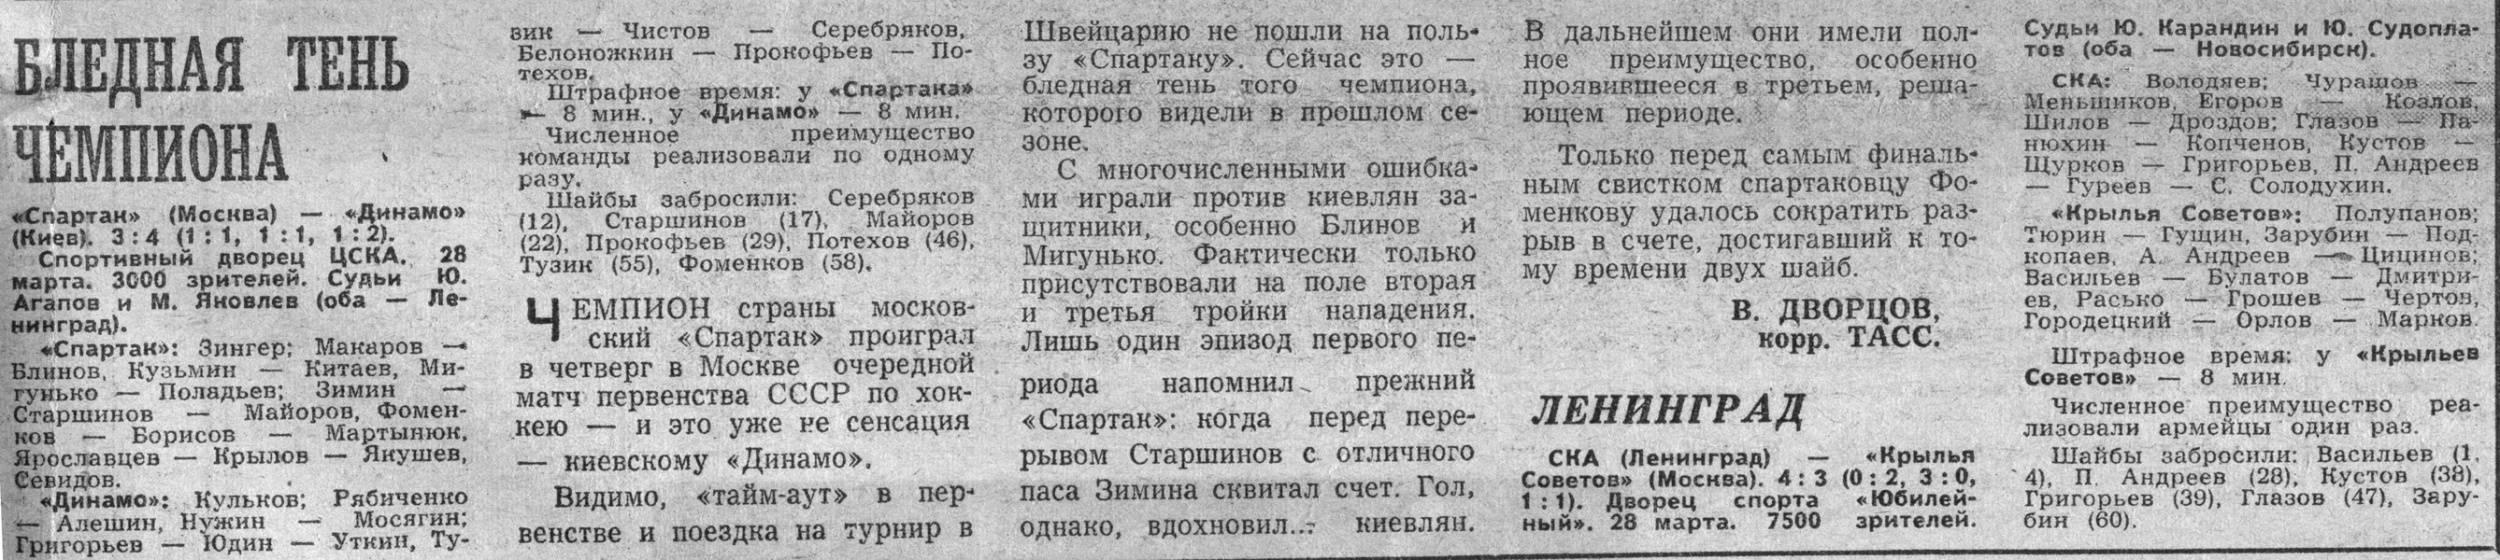 Севидов, александр александрович